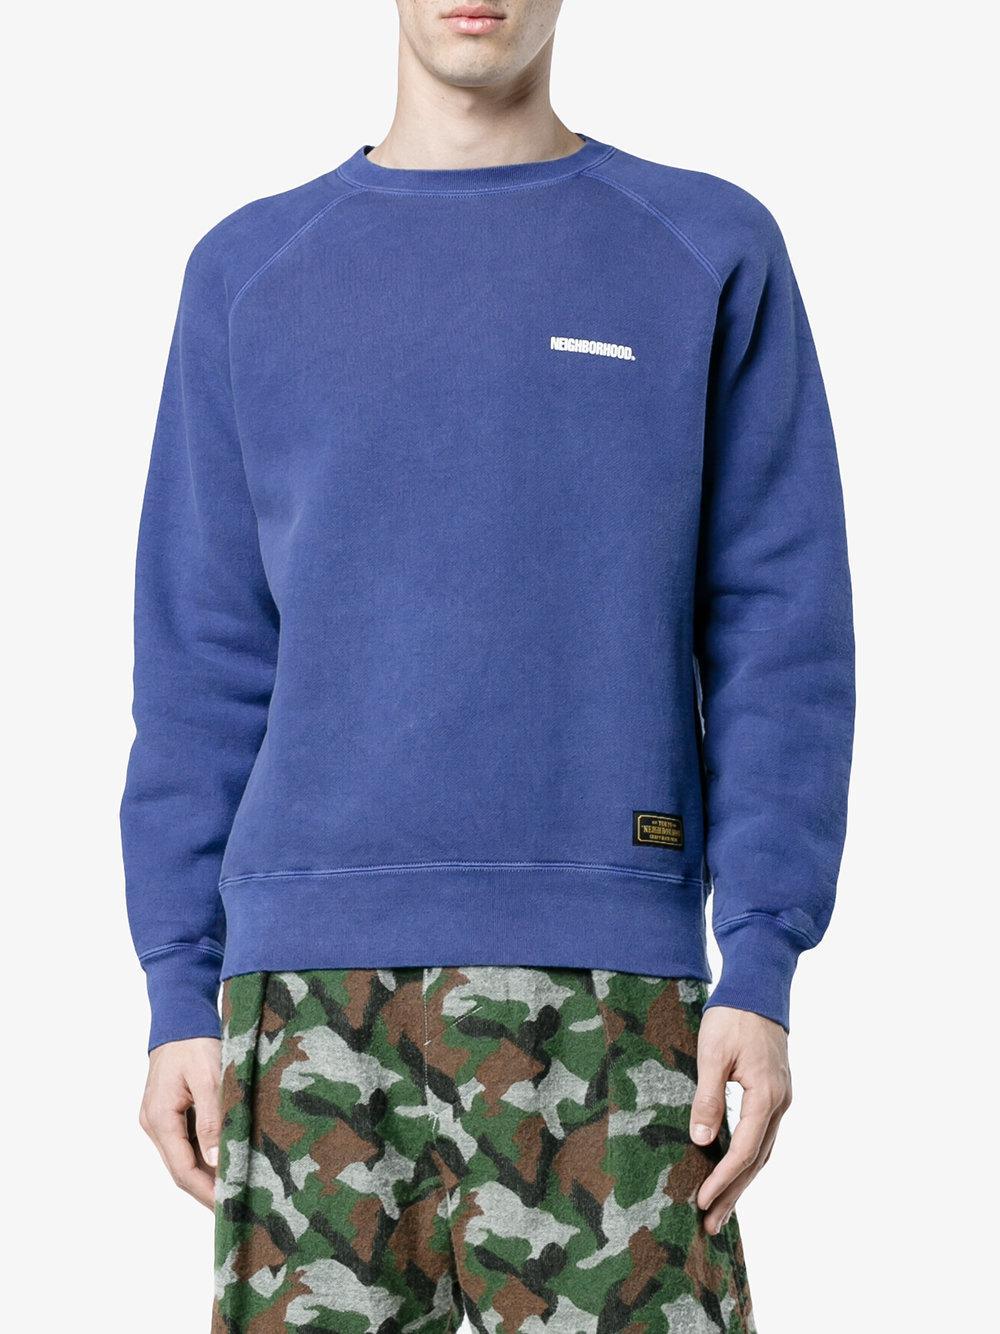 Neighborhood Logo Print Sweatshirt in Blue for Men - Save 4% | Lyst